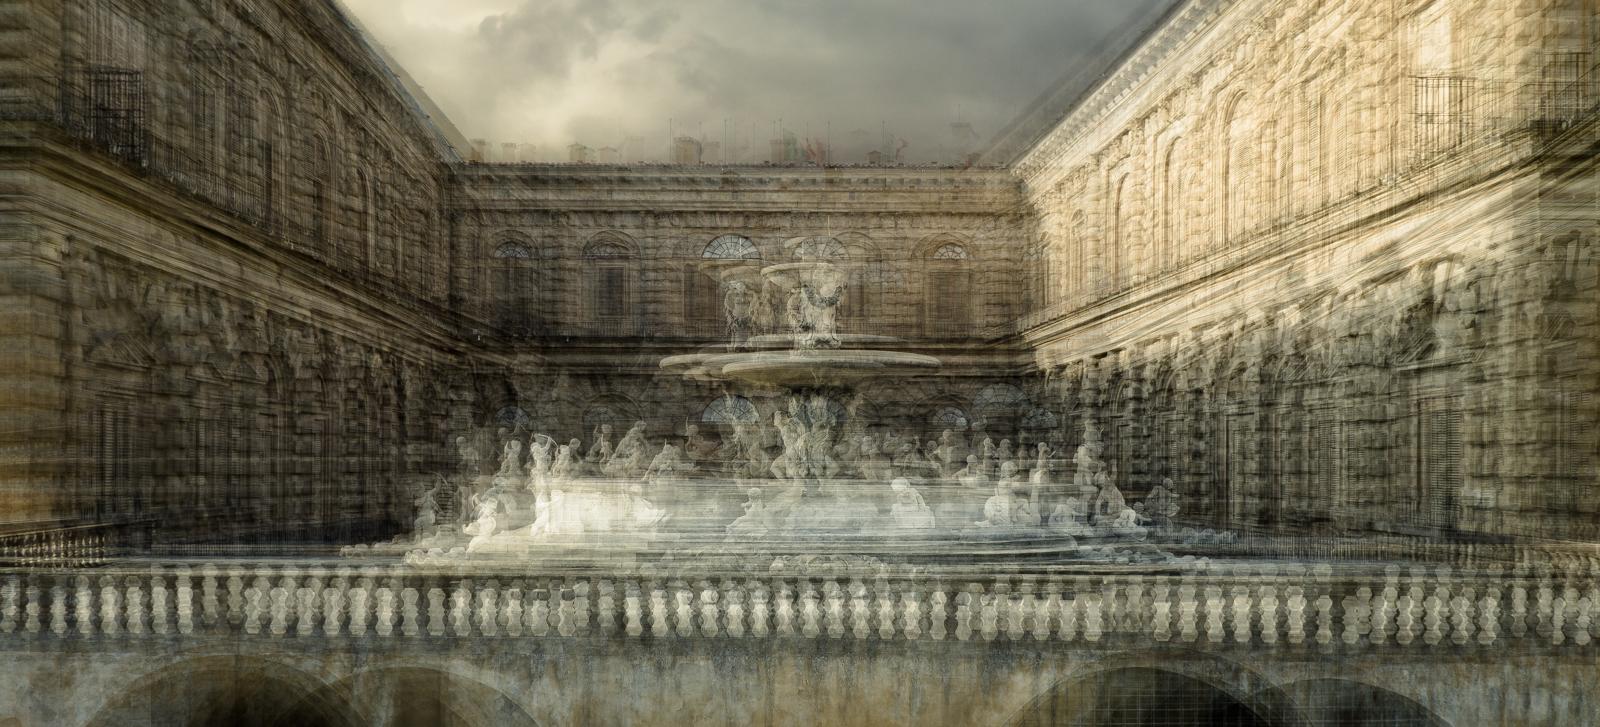 Riccardo Magherini: Firenze